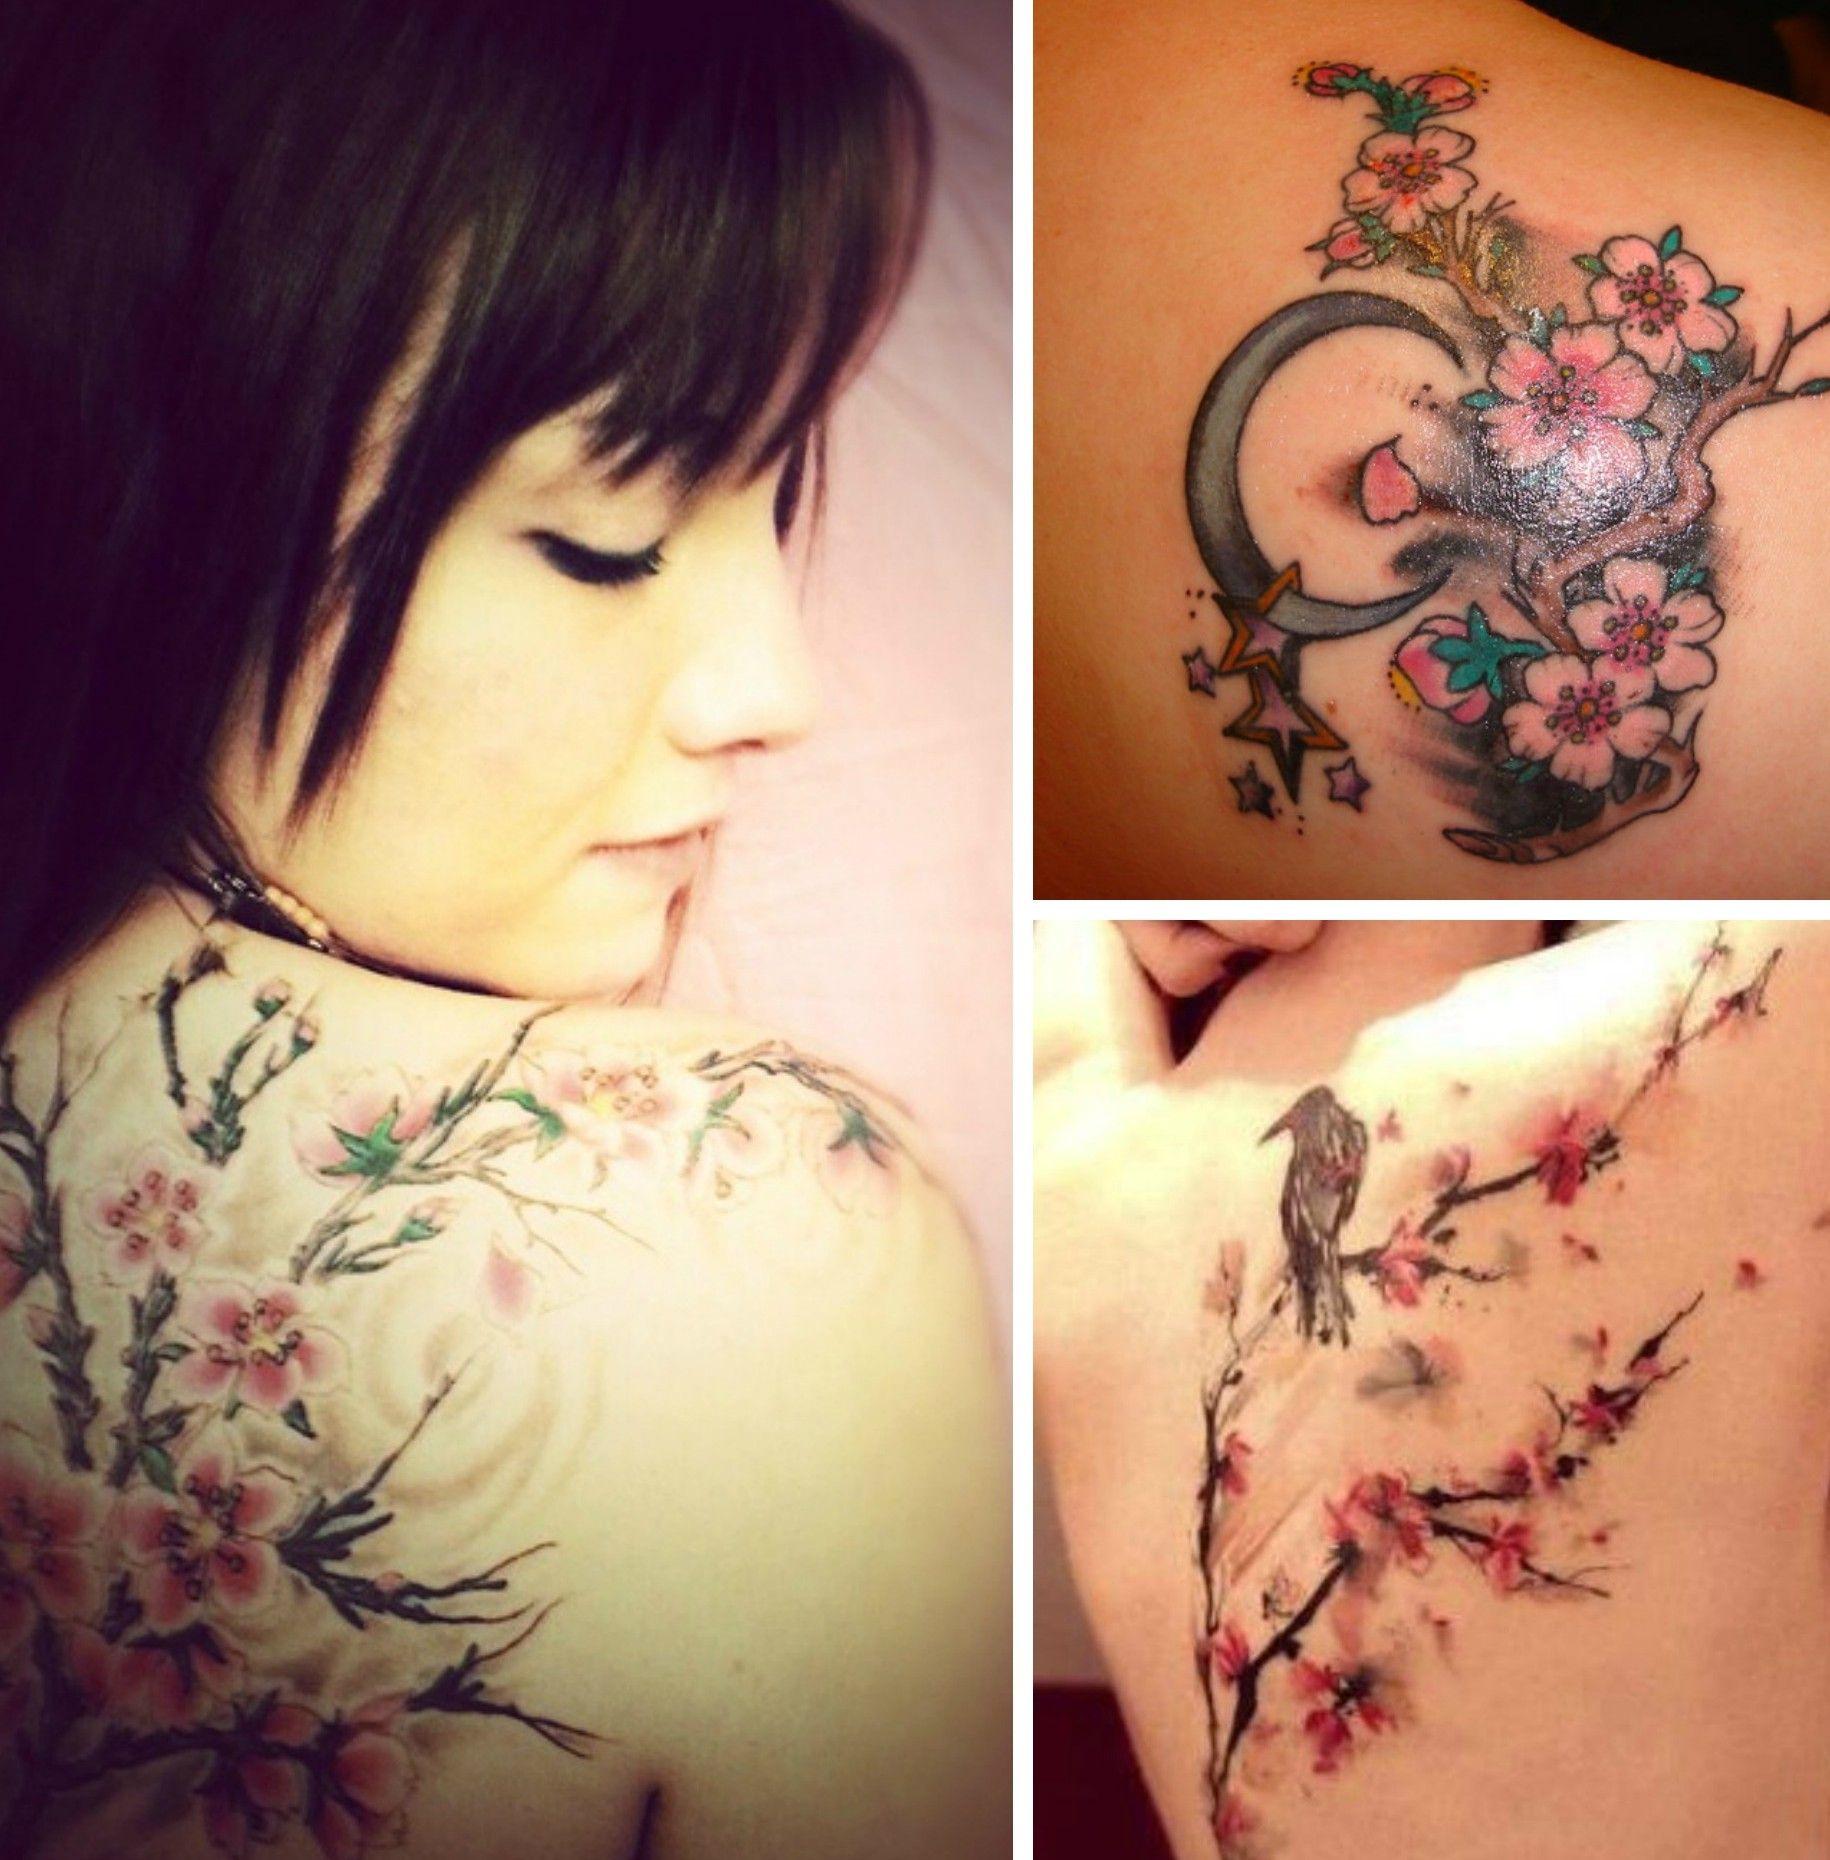 tatouage fleurs de cerisier dos tattoo tatouage fleur. Black Bedroom Furniture Sets. Home Design Ideas